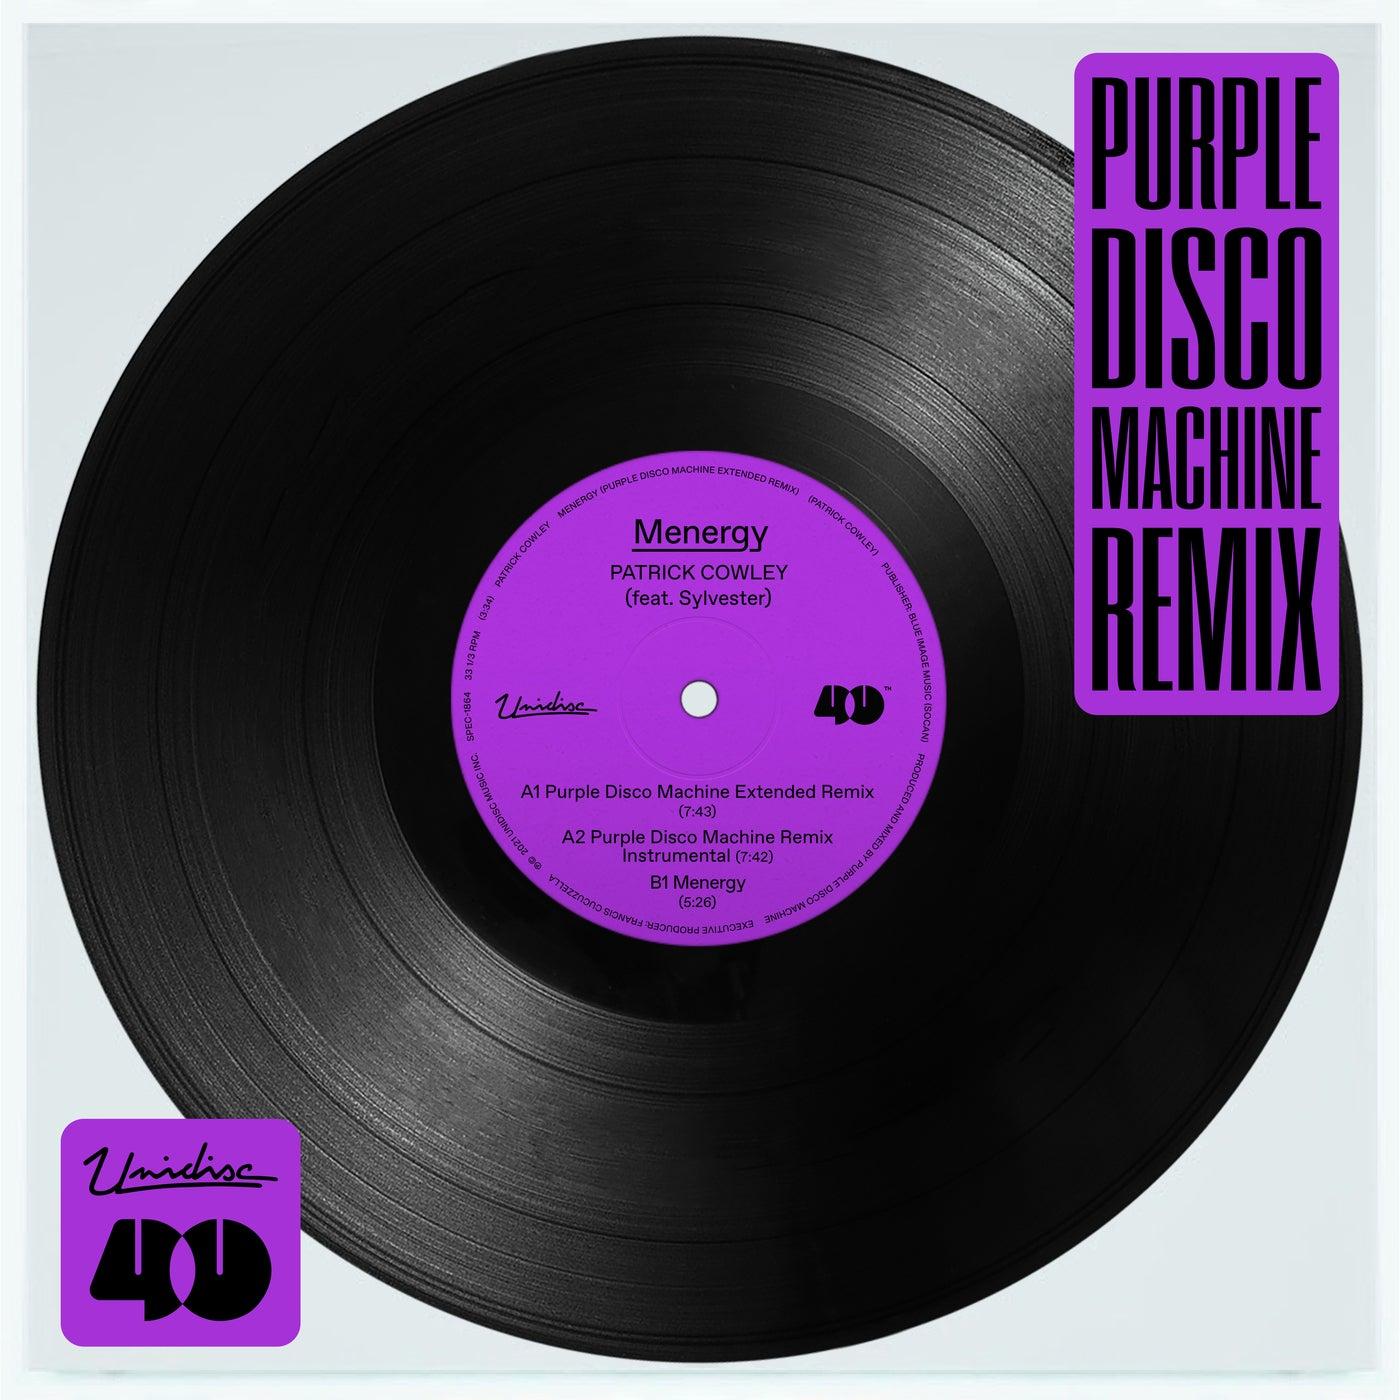 Menergy (Purple Disco Machine Extended Remix)